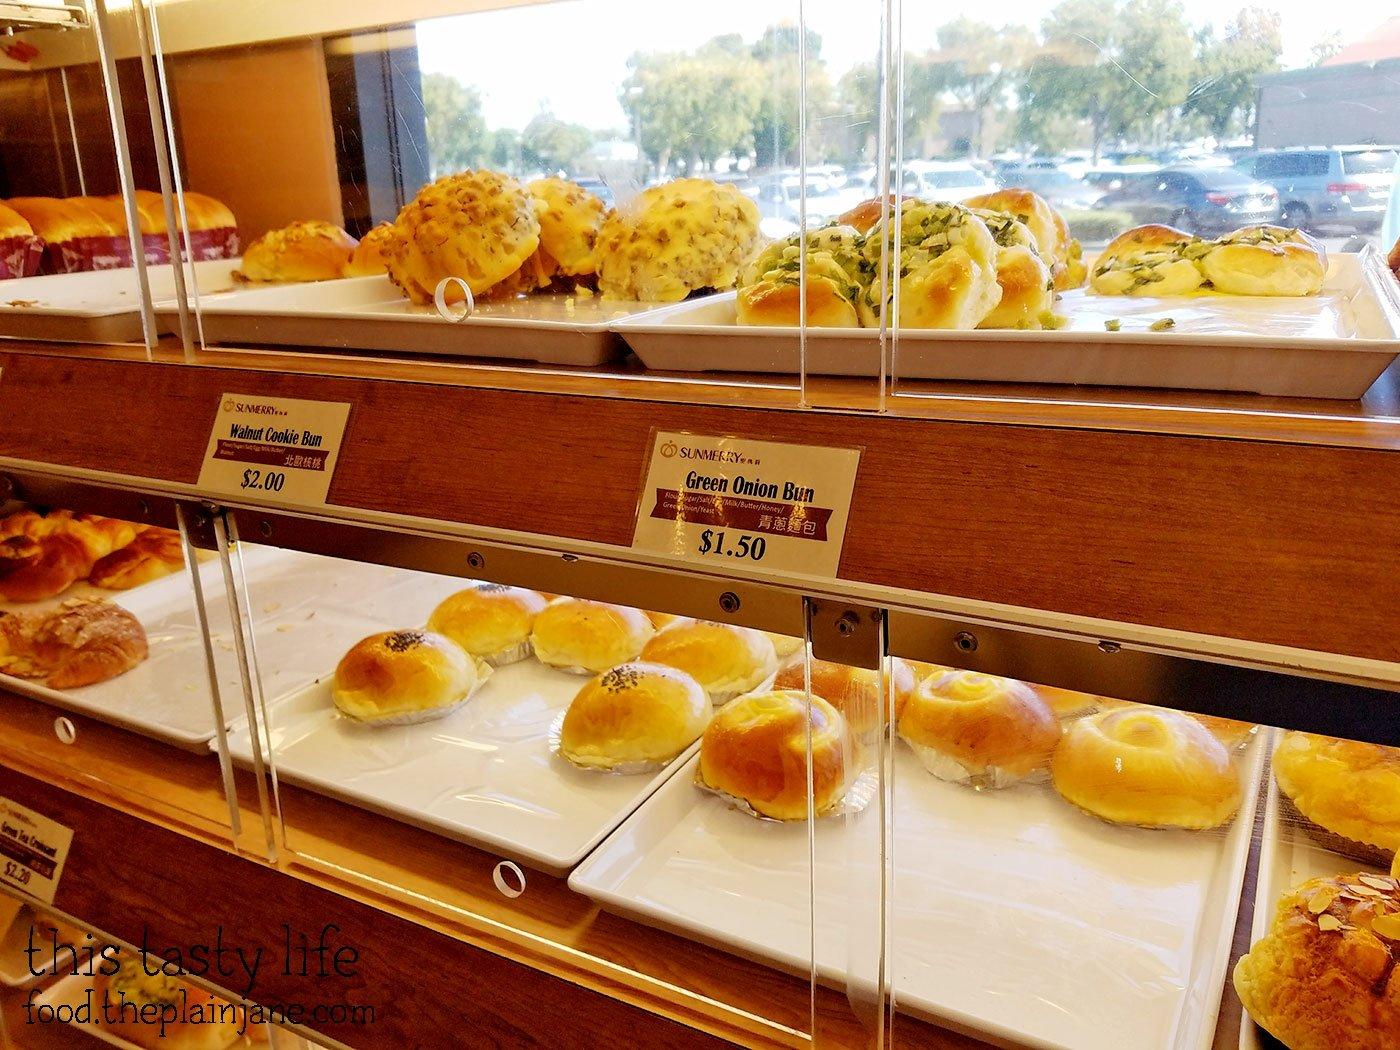 Sunmerry Bakery / Irvine, CA - This Tasty Life